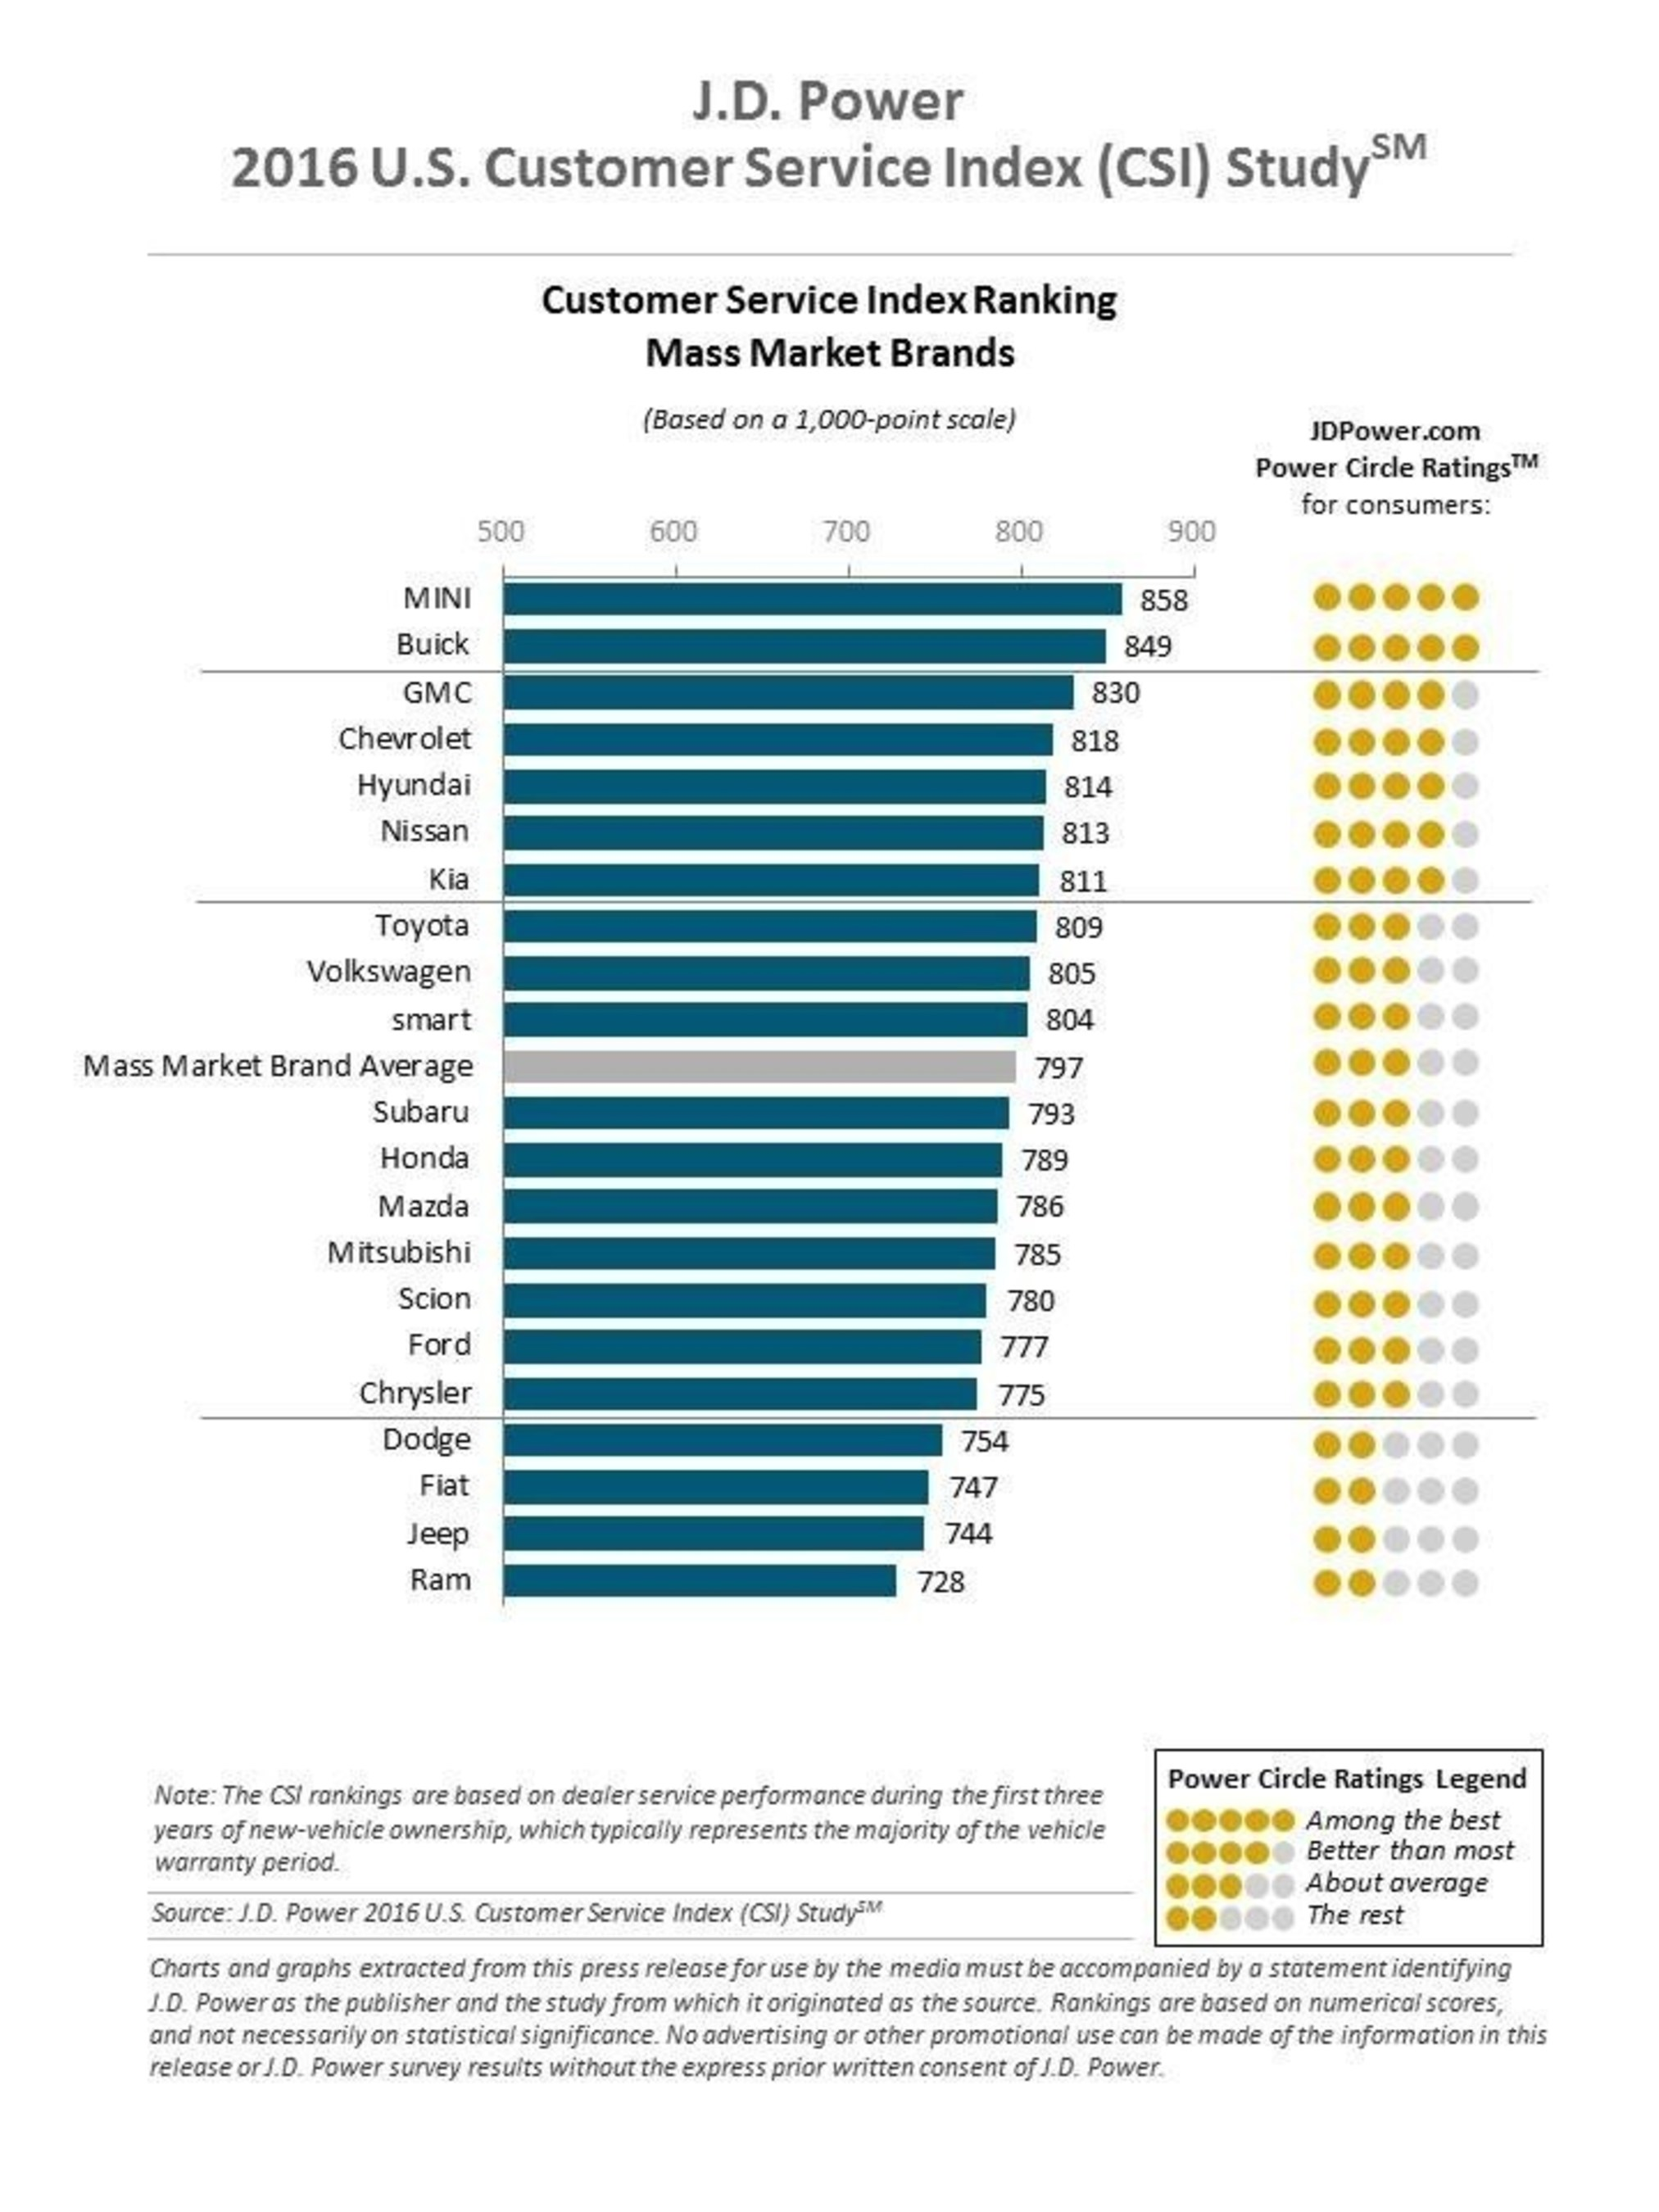 2016 U.S. CSI Rank Mass Market